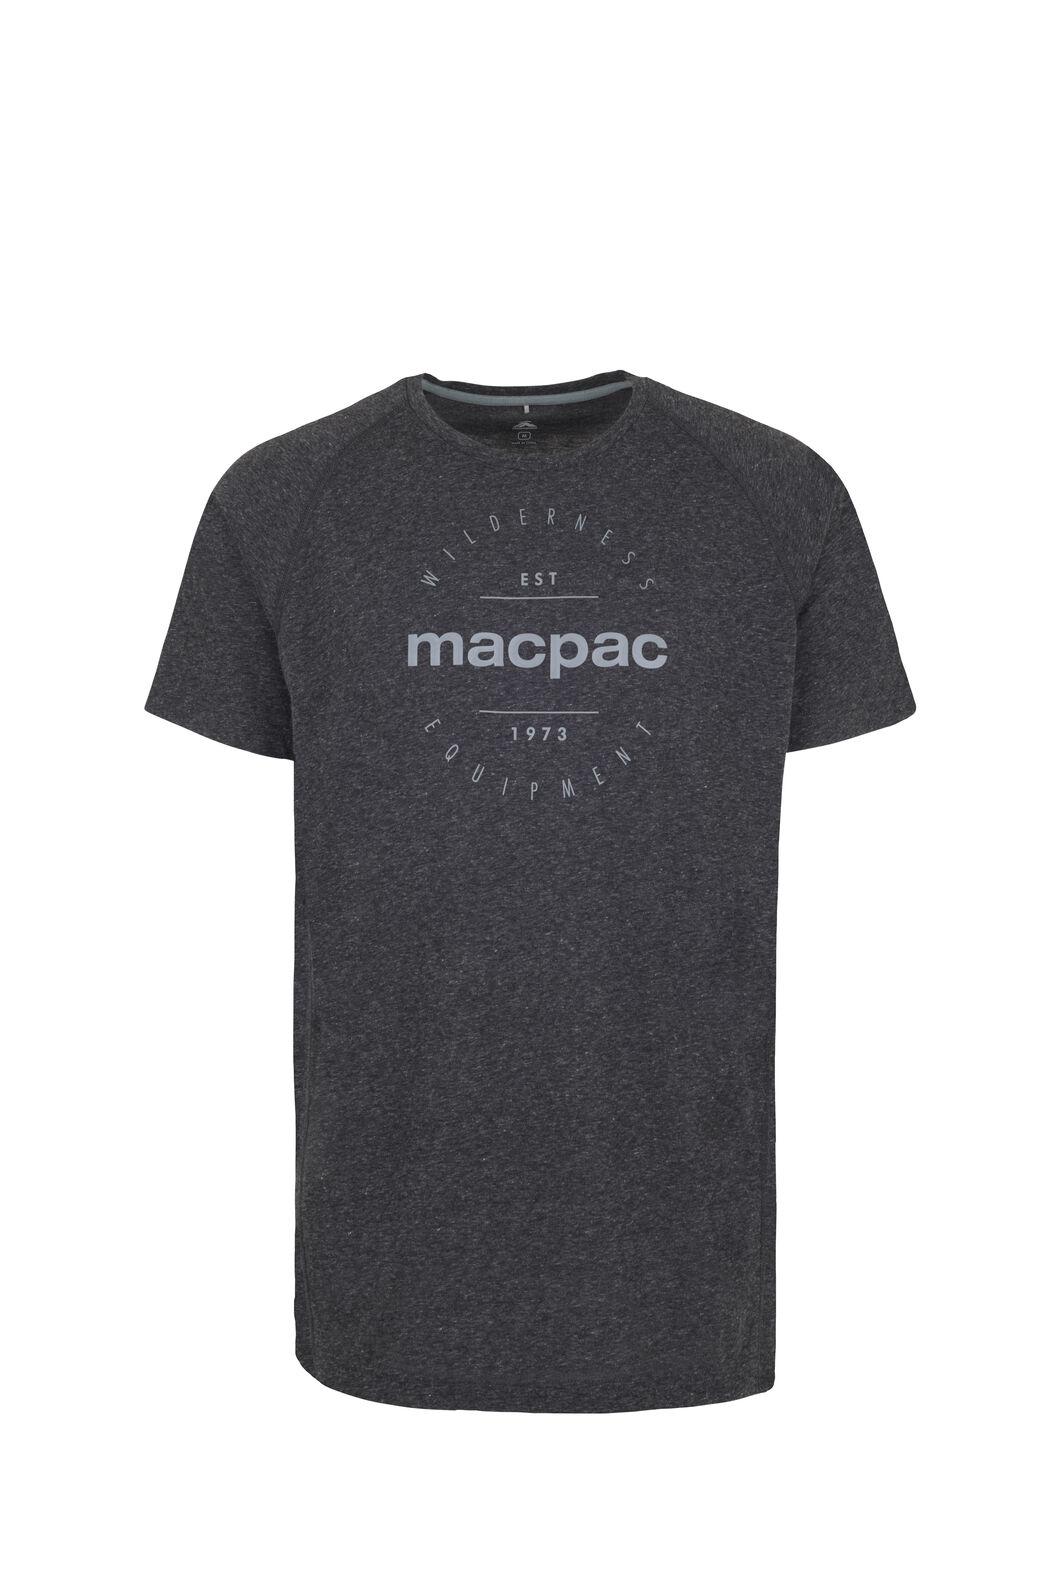 Macpac Polycotton Tee - Men's, Charcoal Marle, hi-res